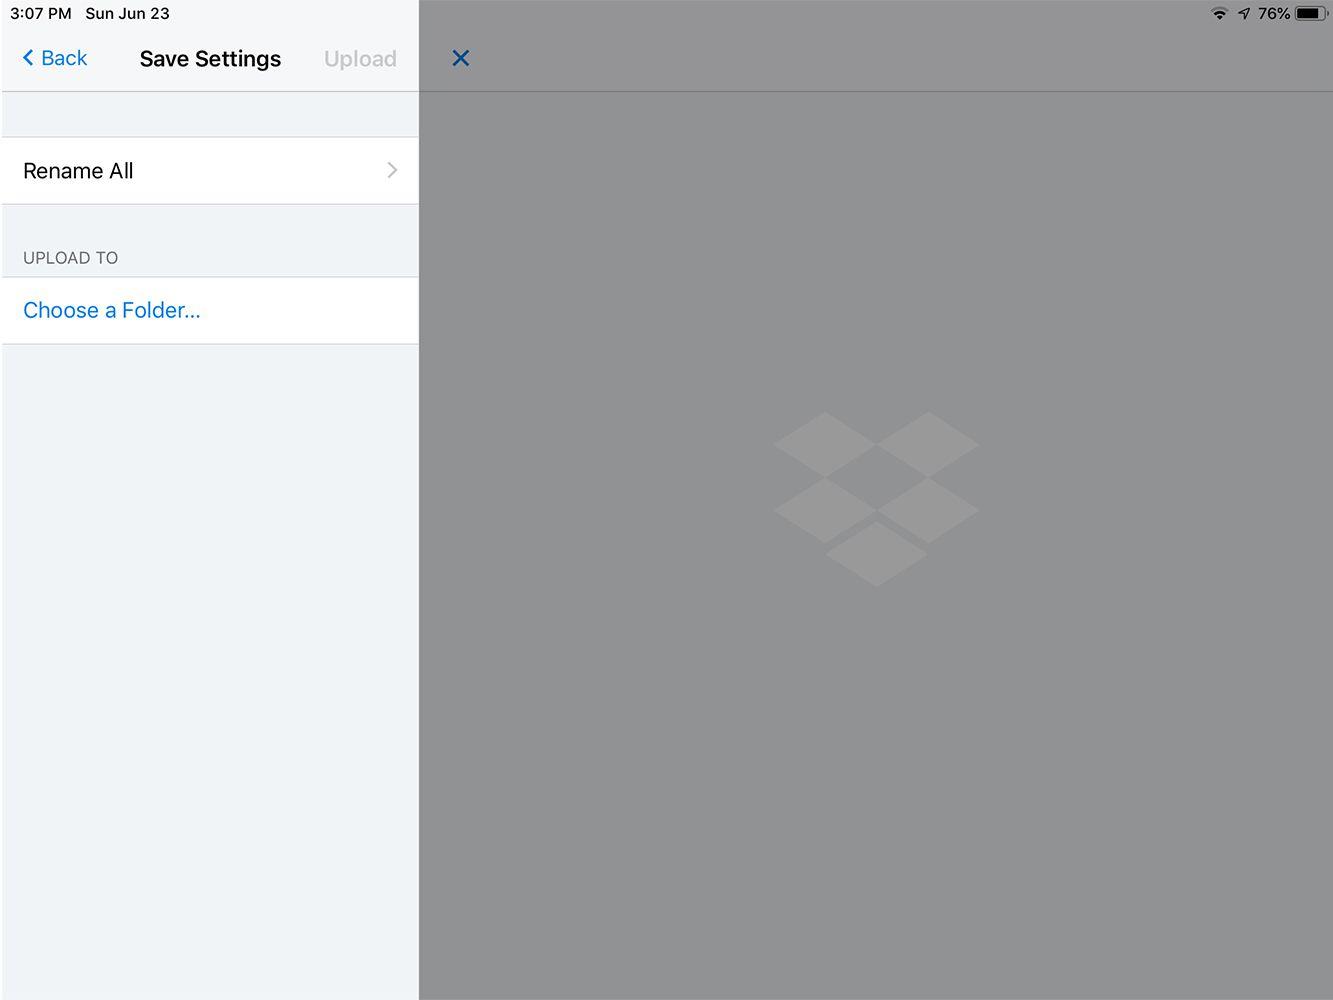 How to Set Up Dropbox on the iPad